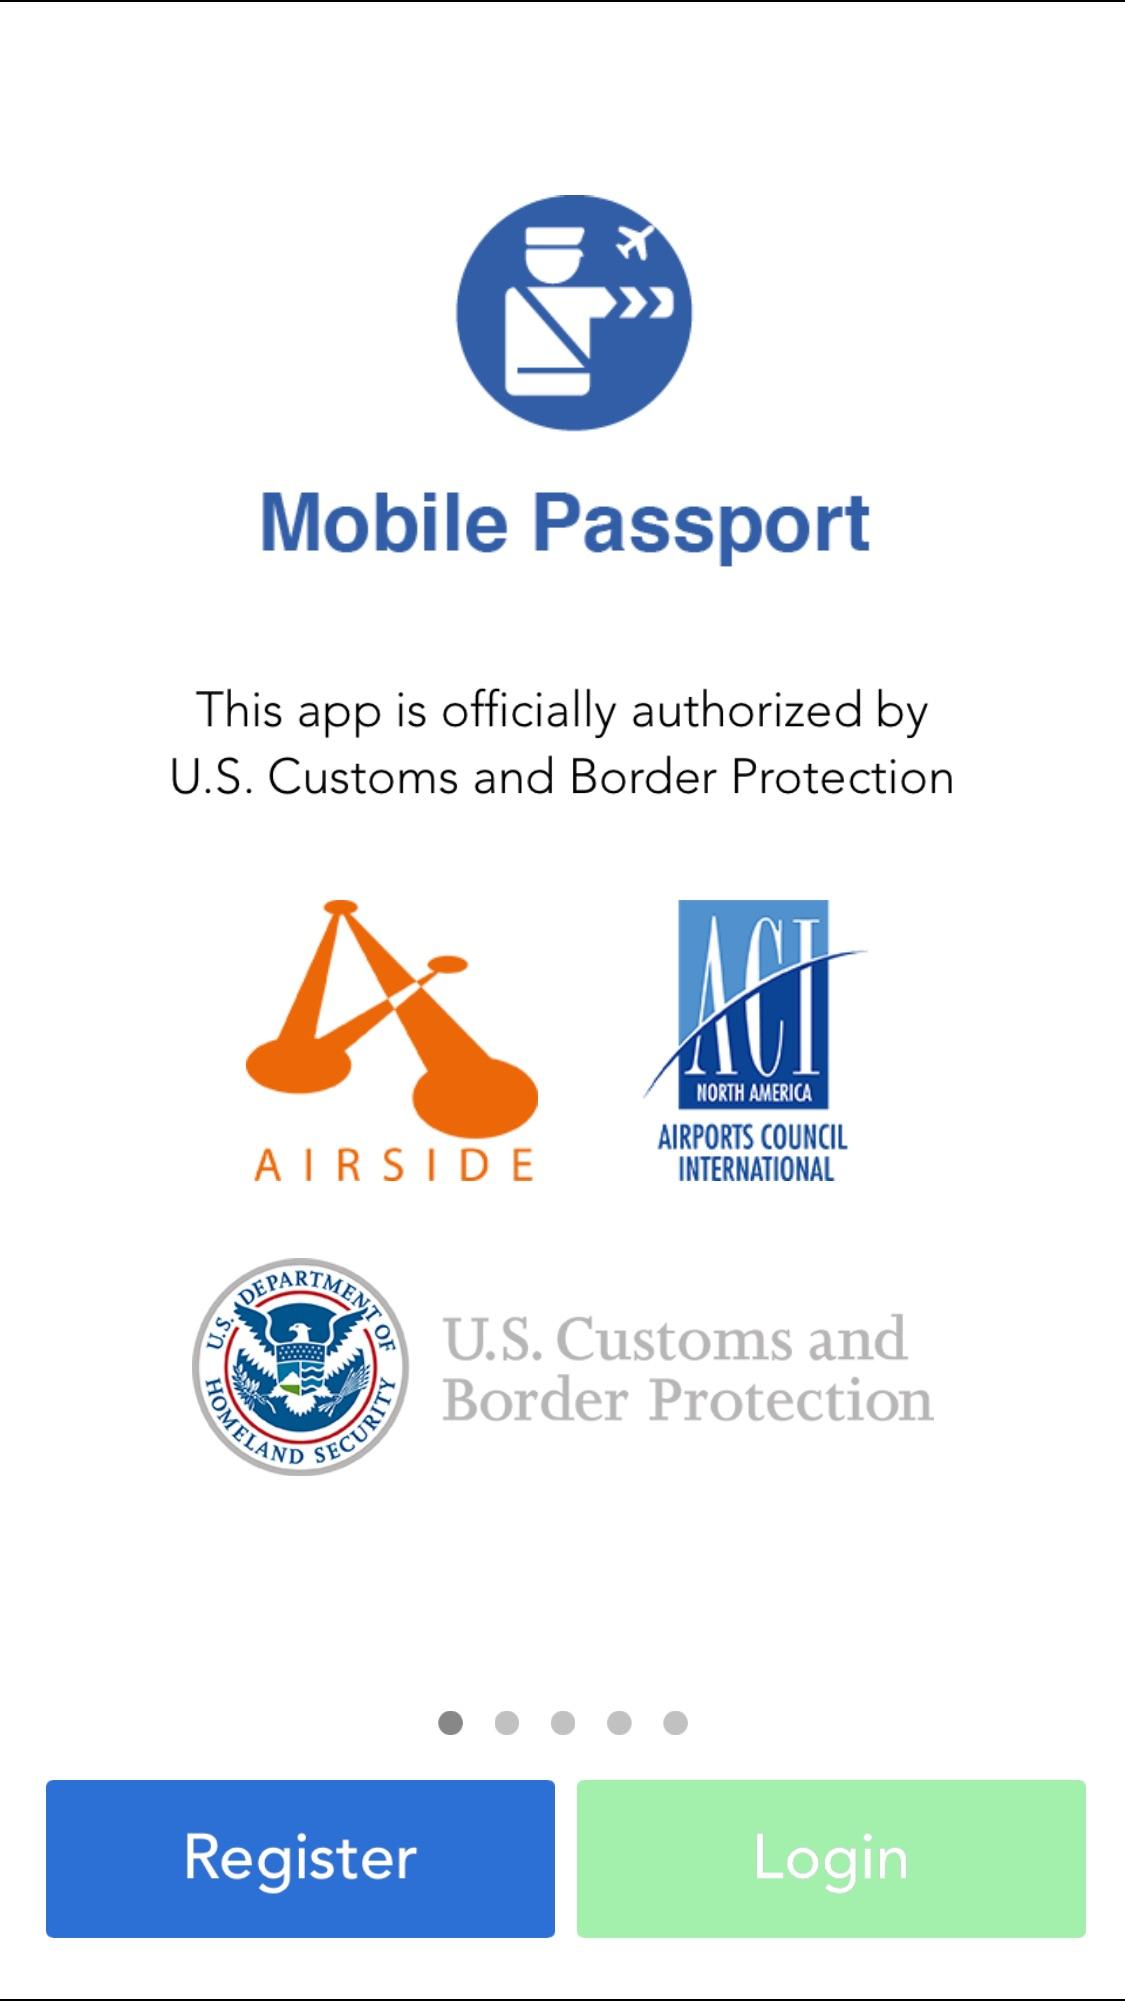 New Mobile Passport Control App